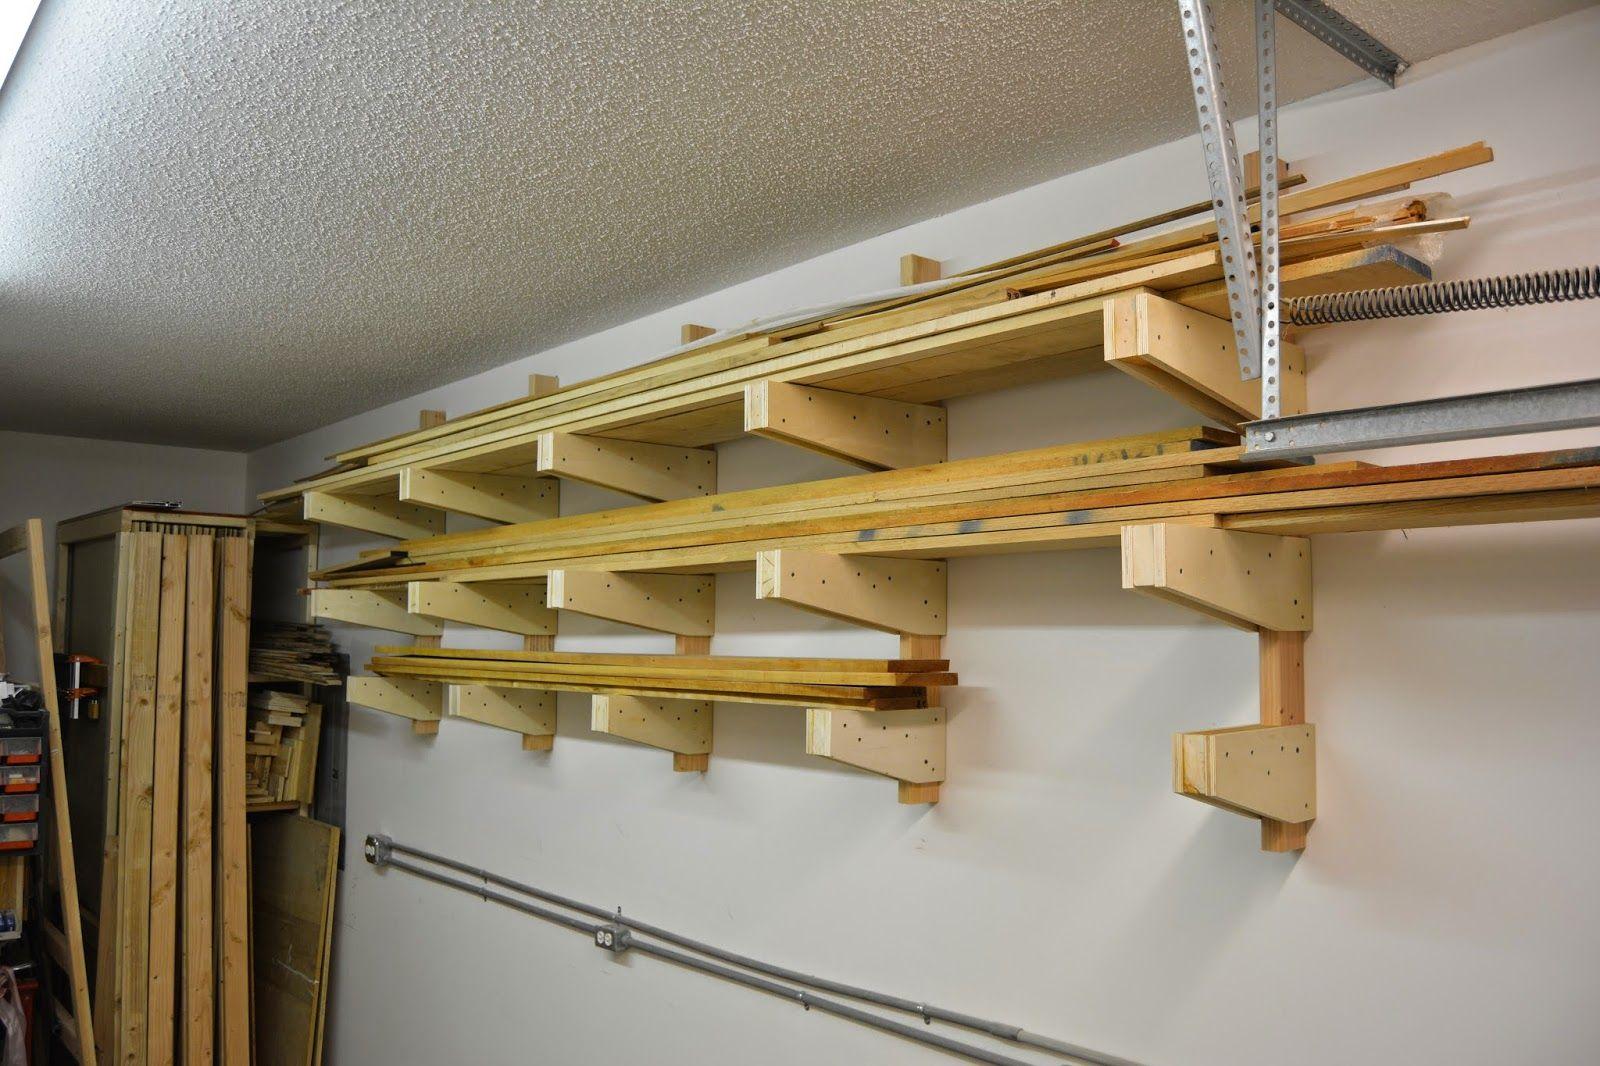 9 diy ideas for wood storage | woodworking | lumber storage